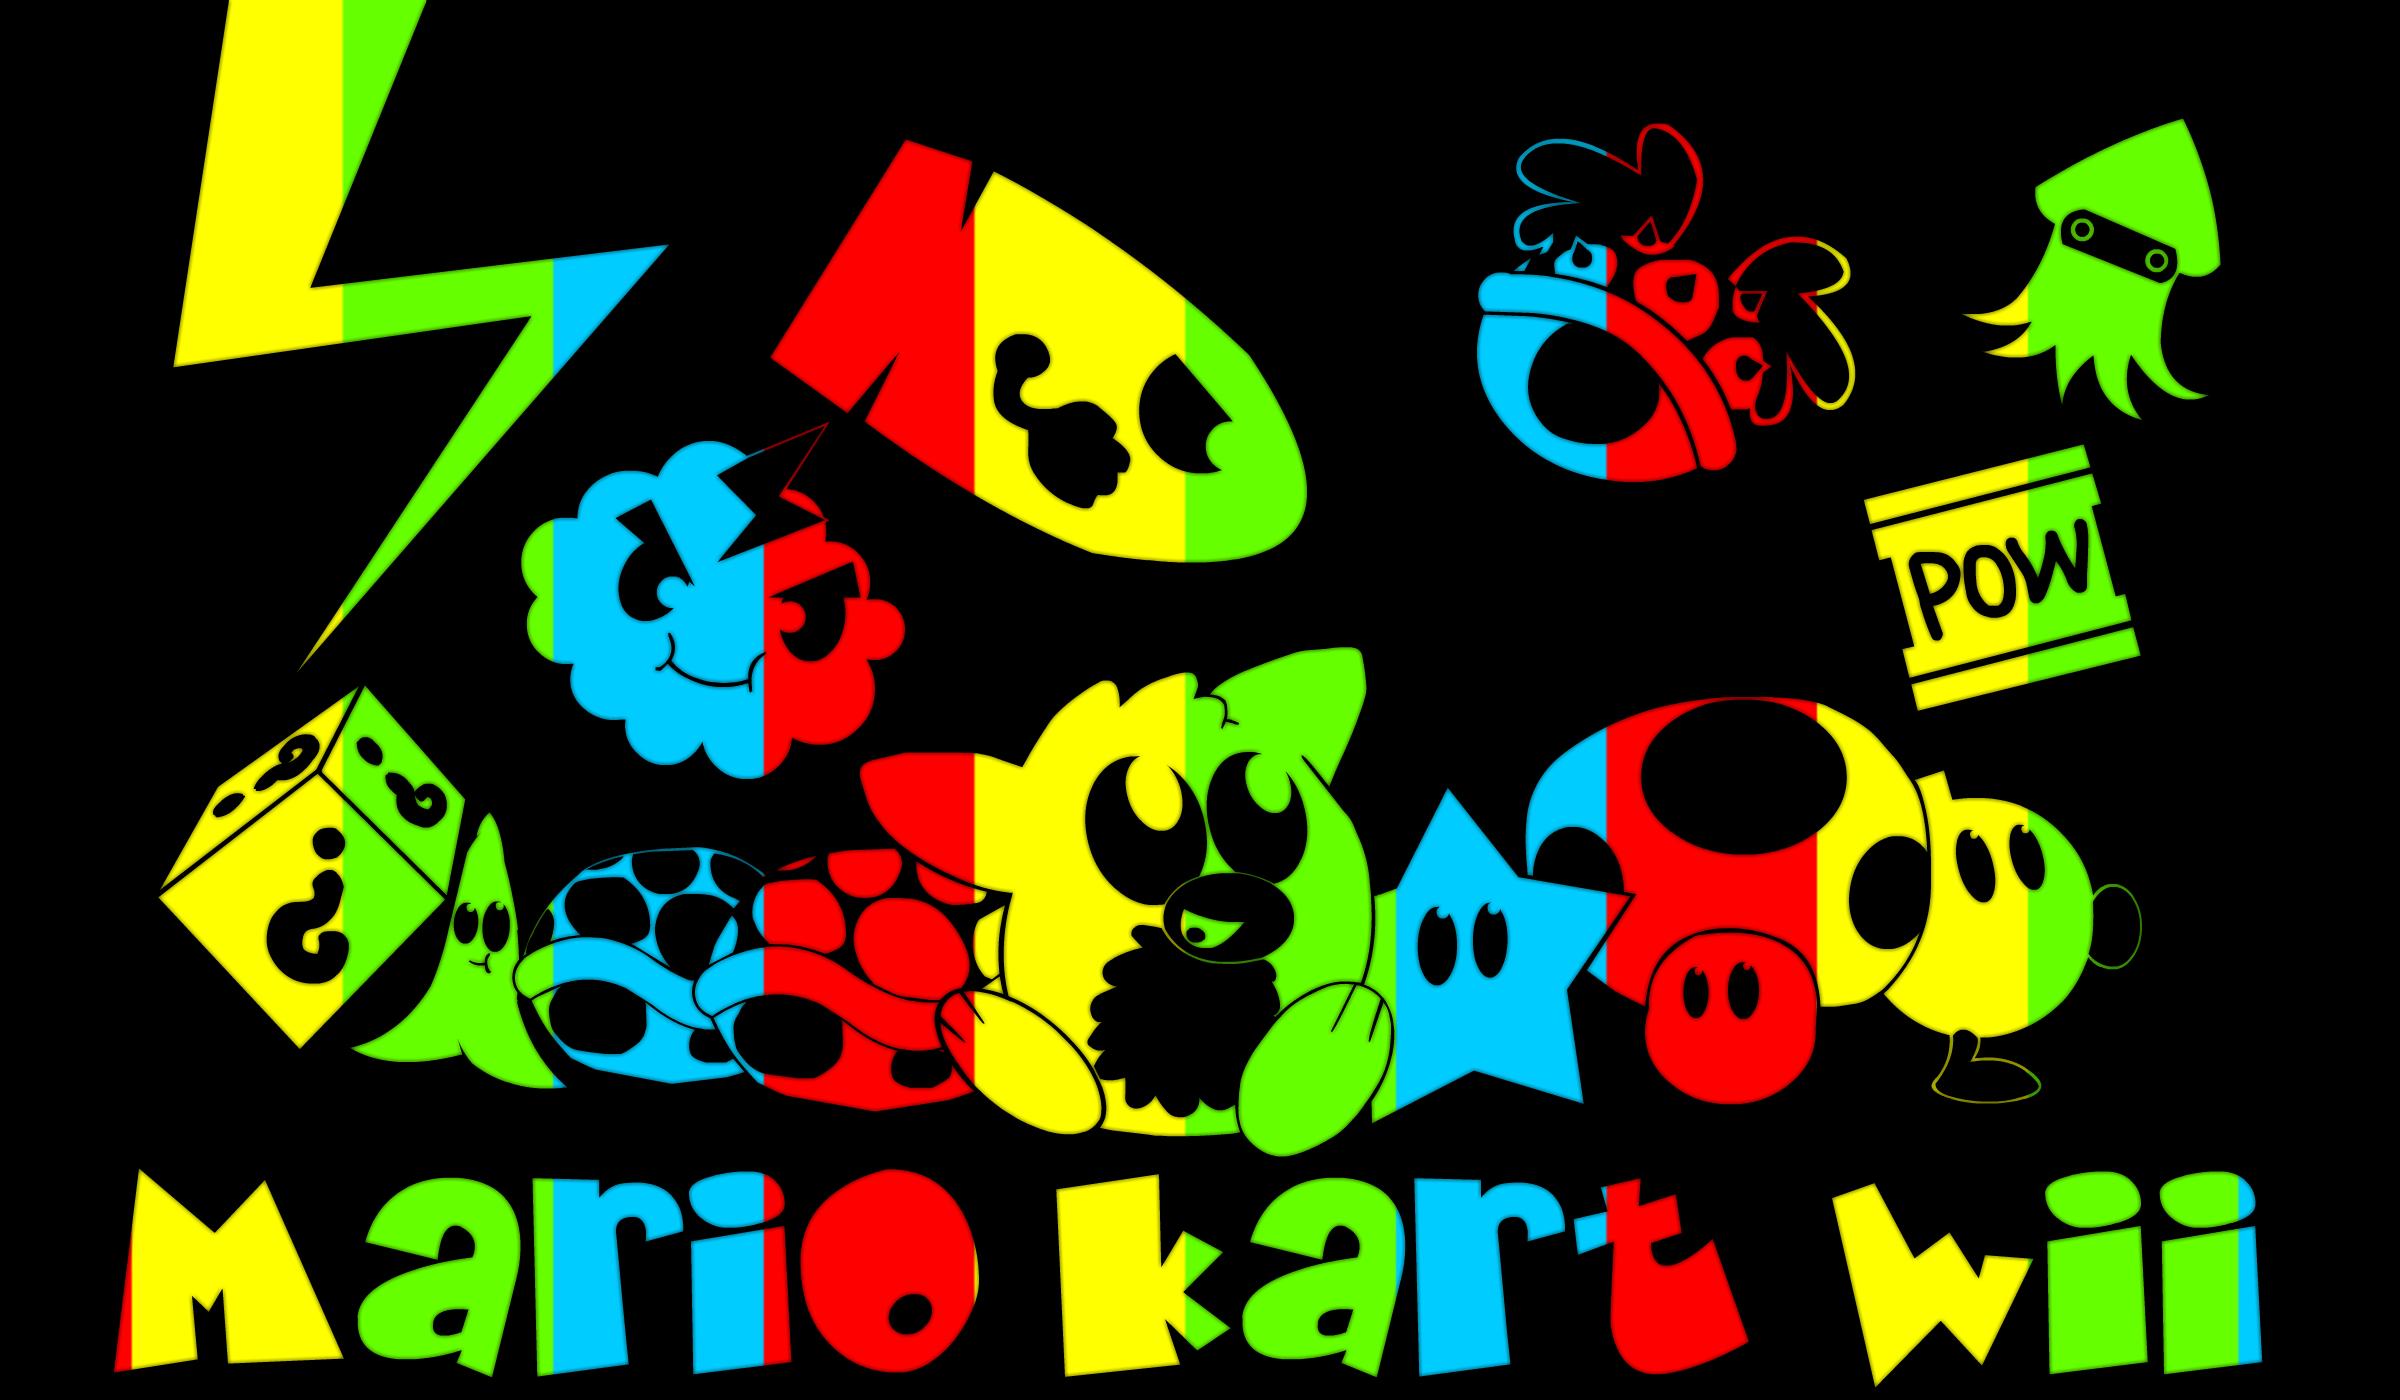 Mario Kart Wii - Furby12435vr